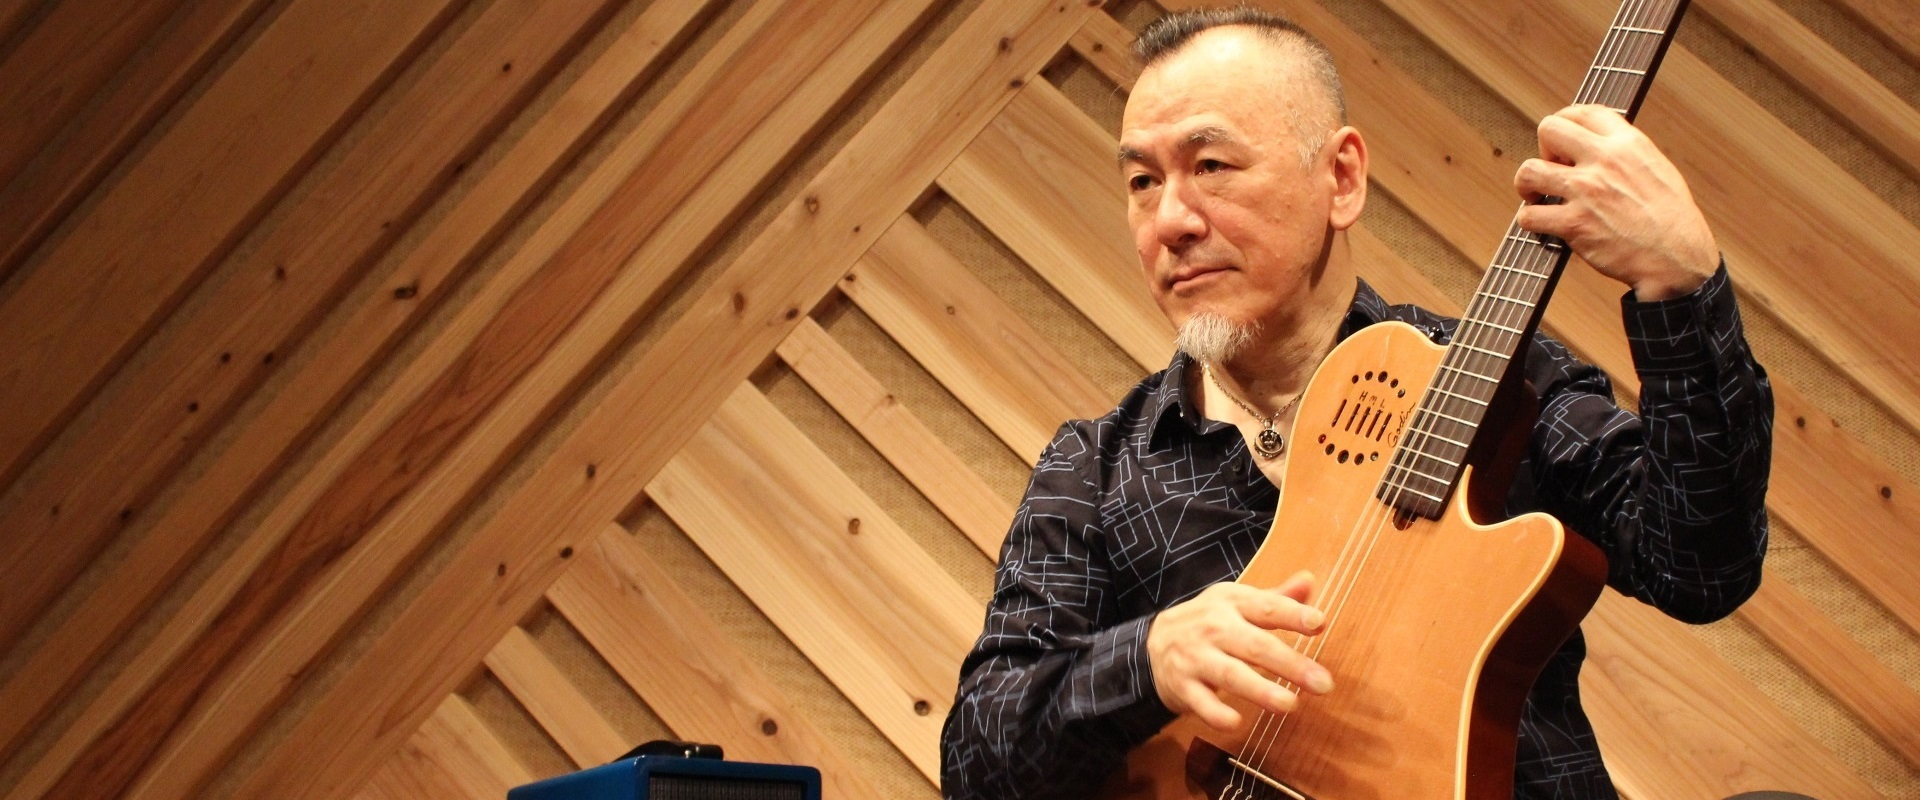 Akio Yokota